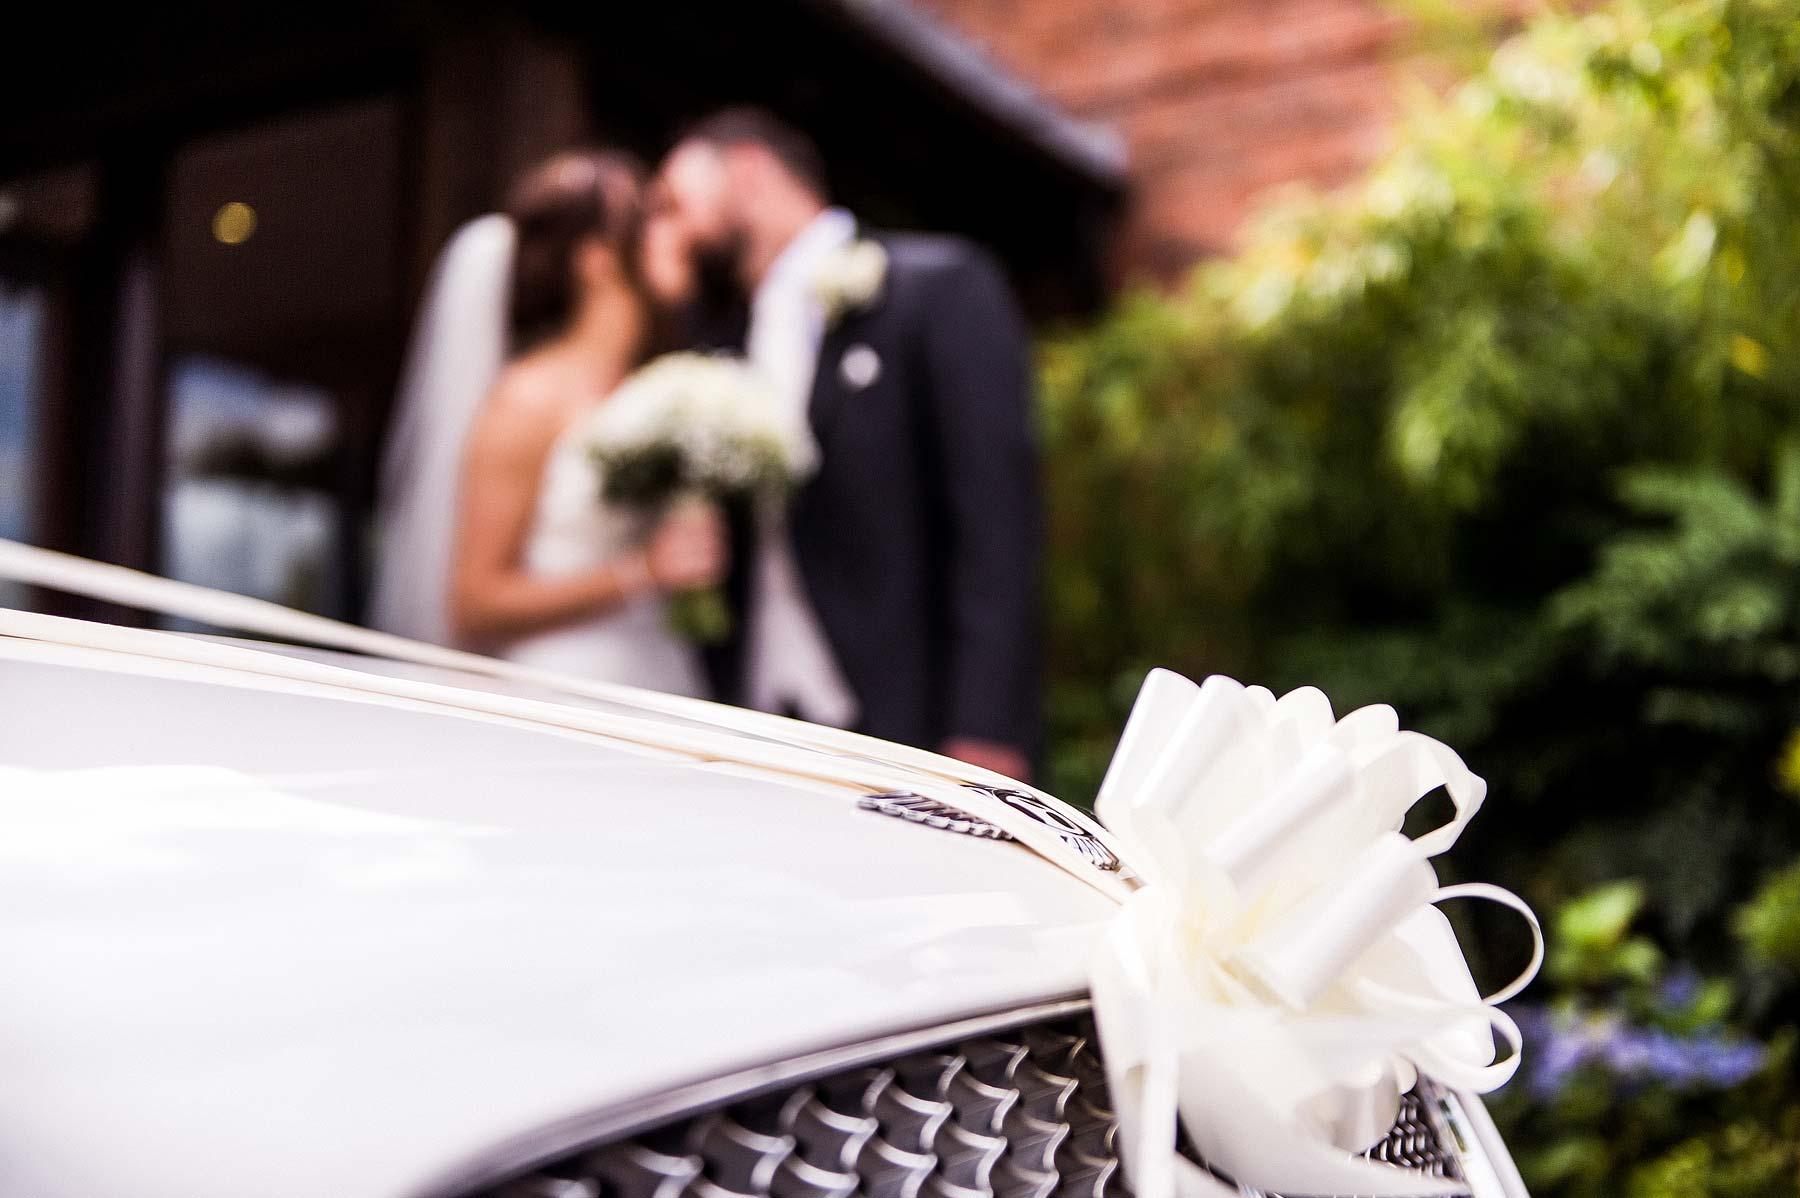 moat-house-church-wedding-photographs-046